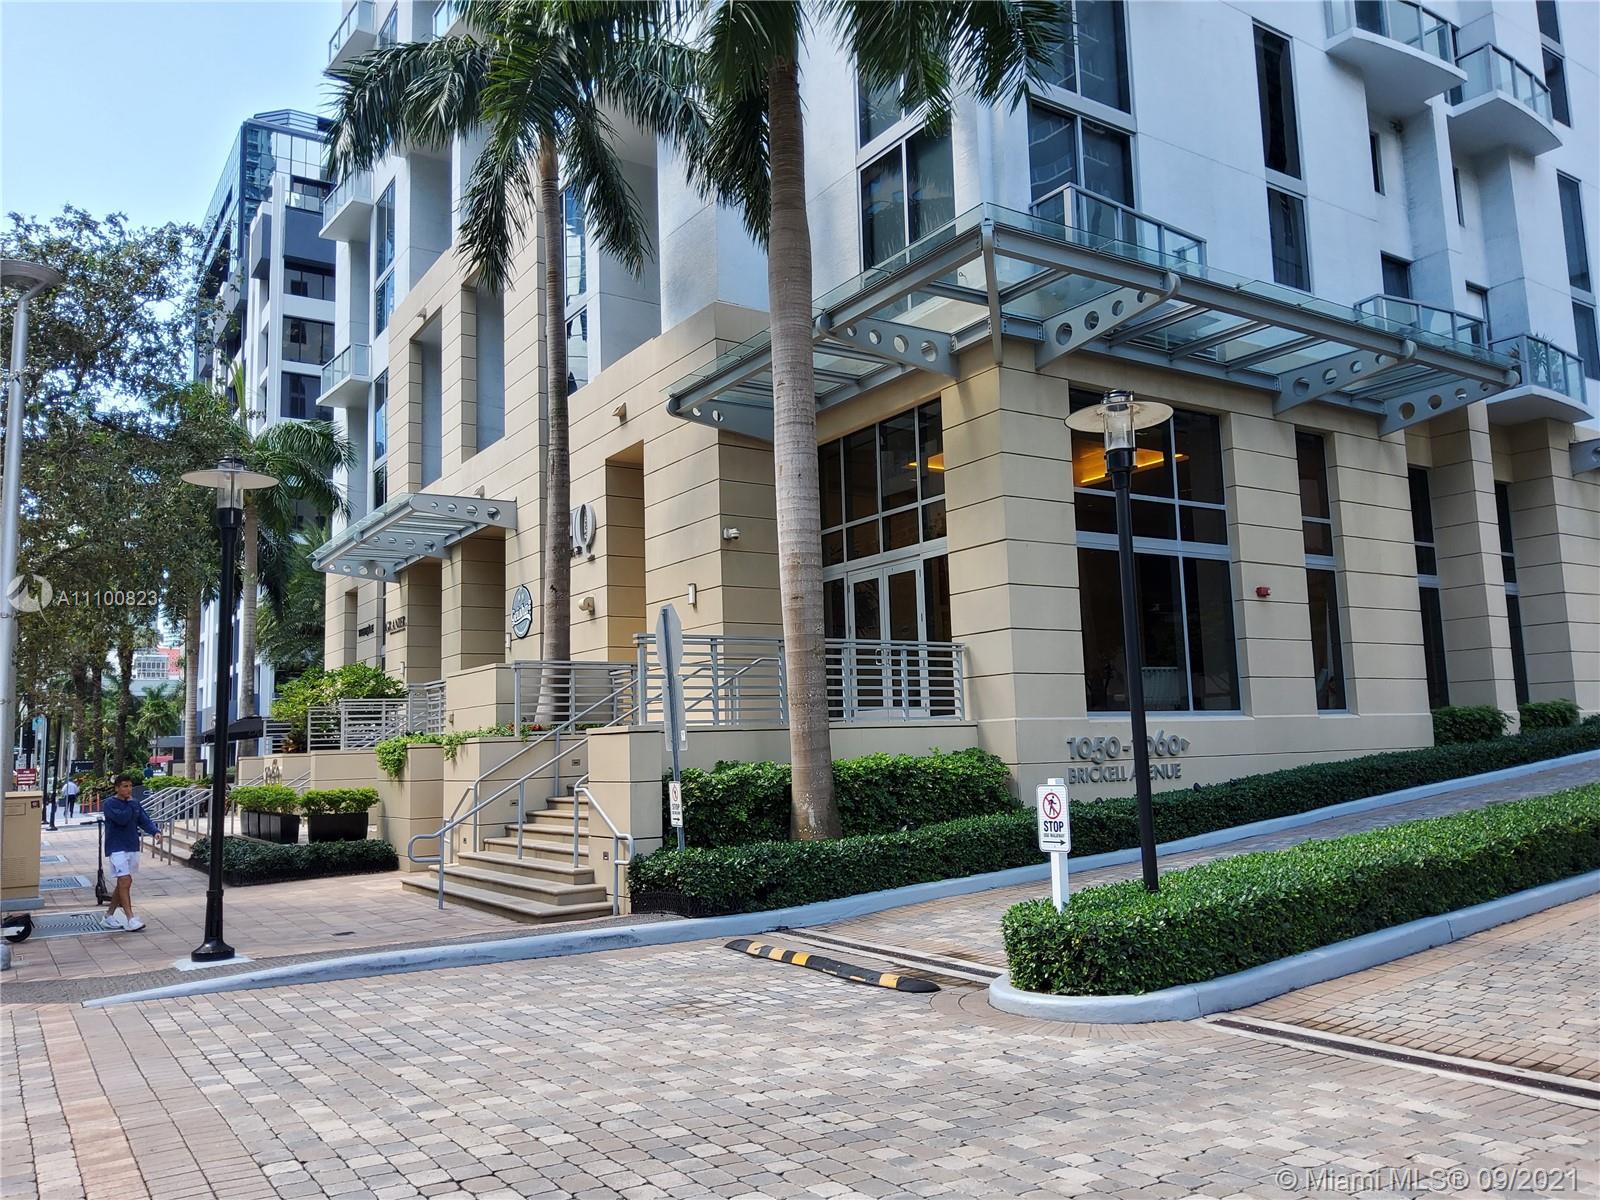 1060 Brickell East Tower #2220 - 1050 Brickell Ave #2220, Miami, FL 33131